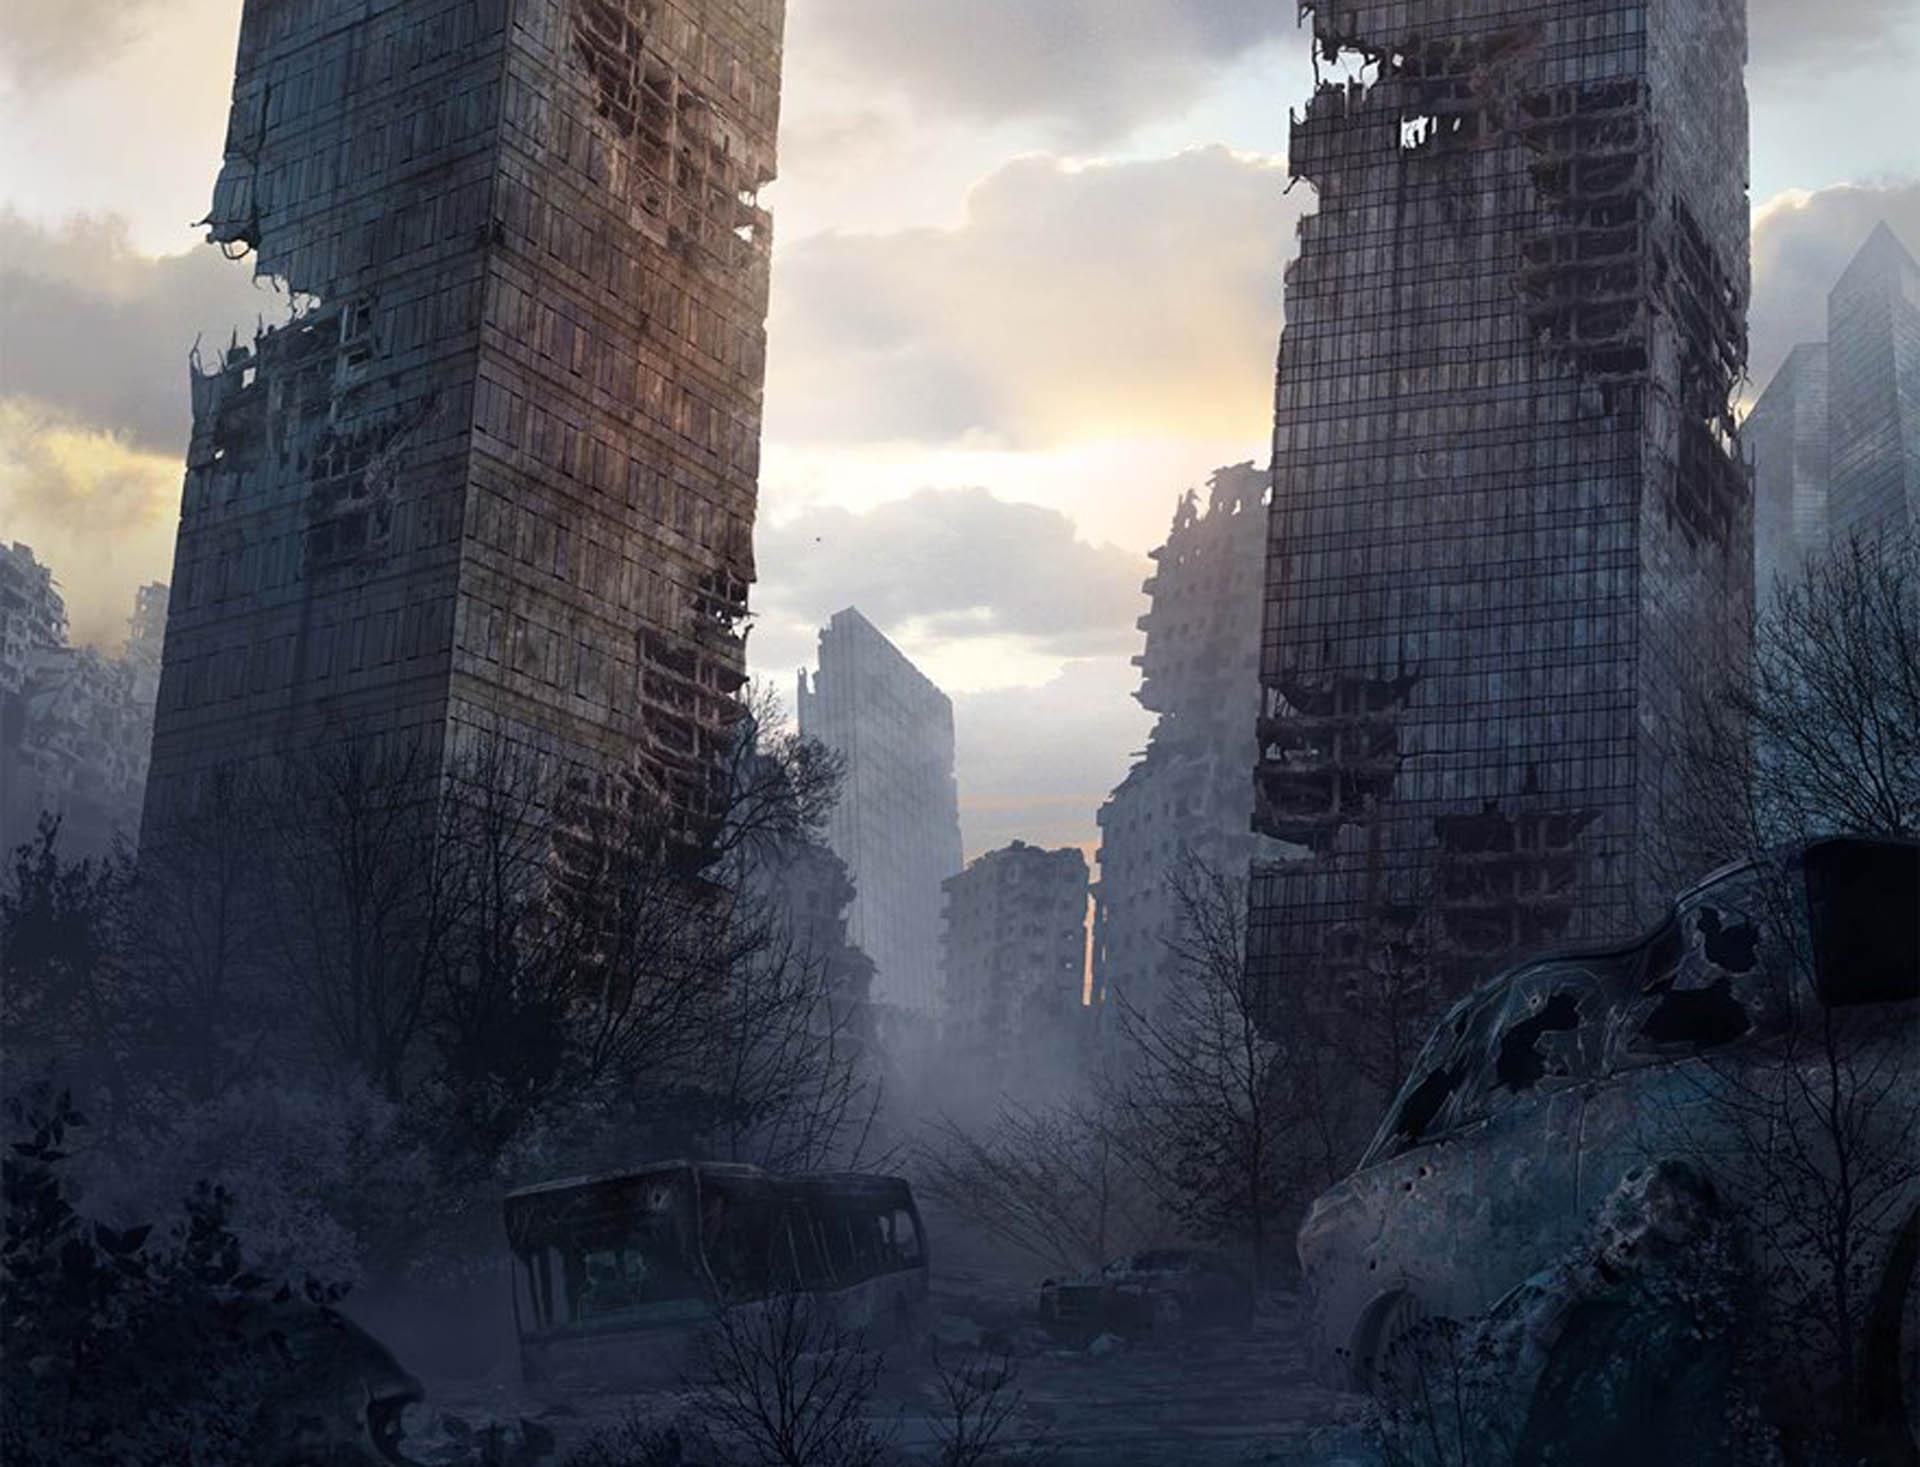 background Knight : La Geste de la fin des temps